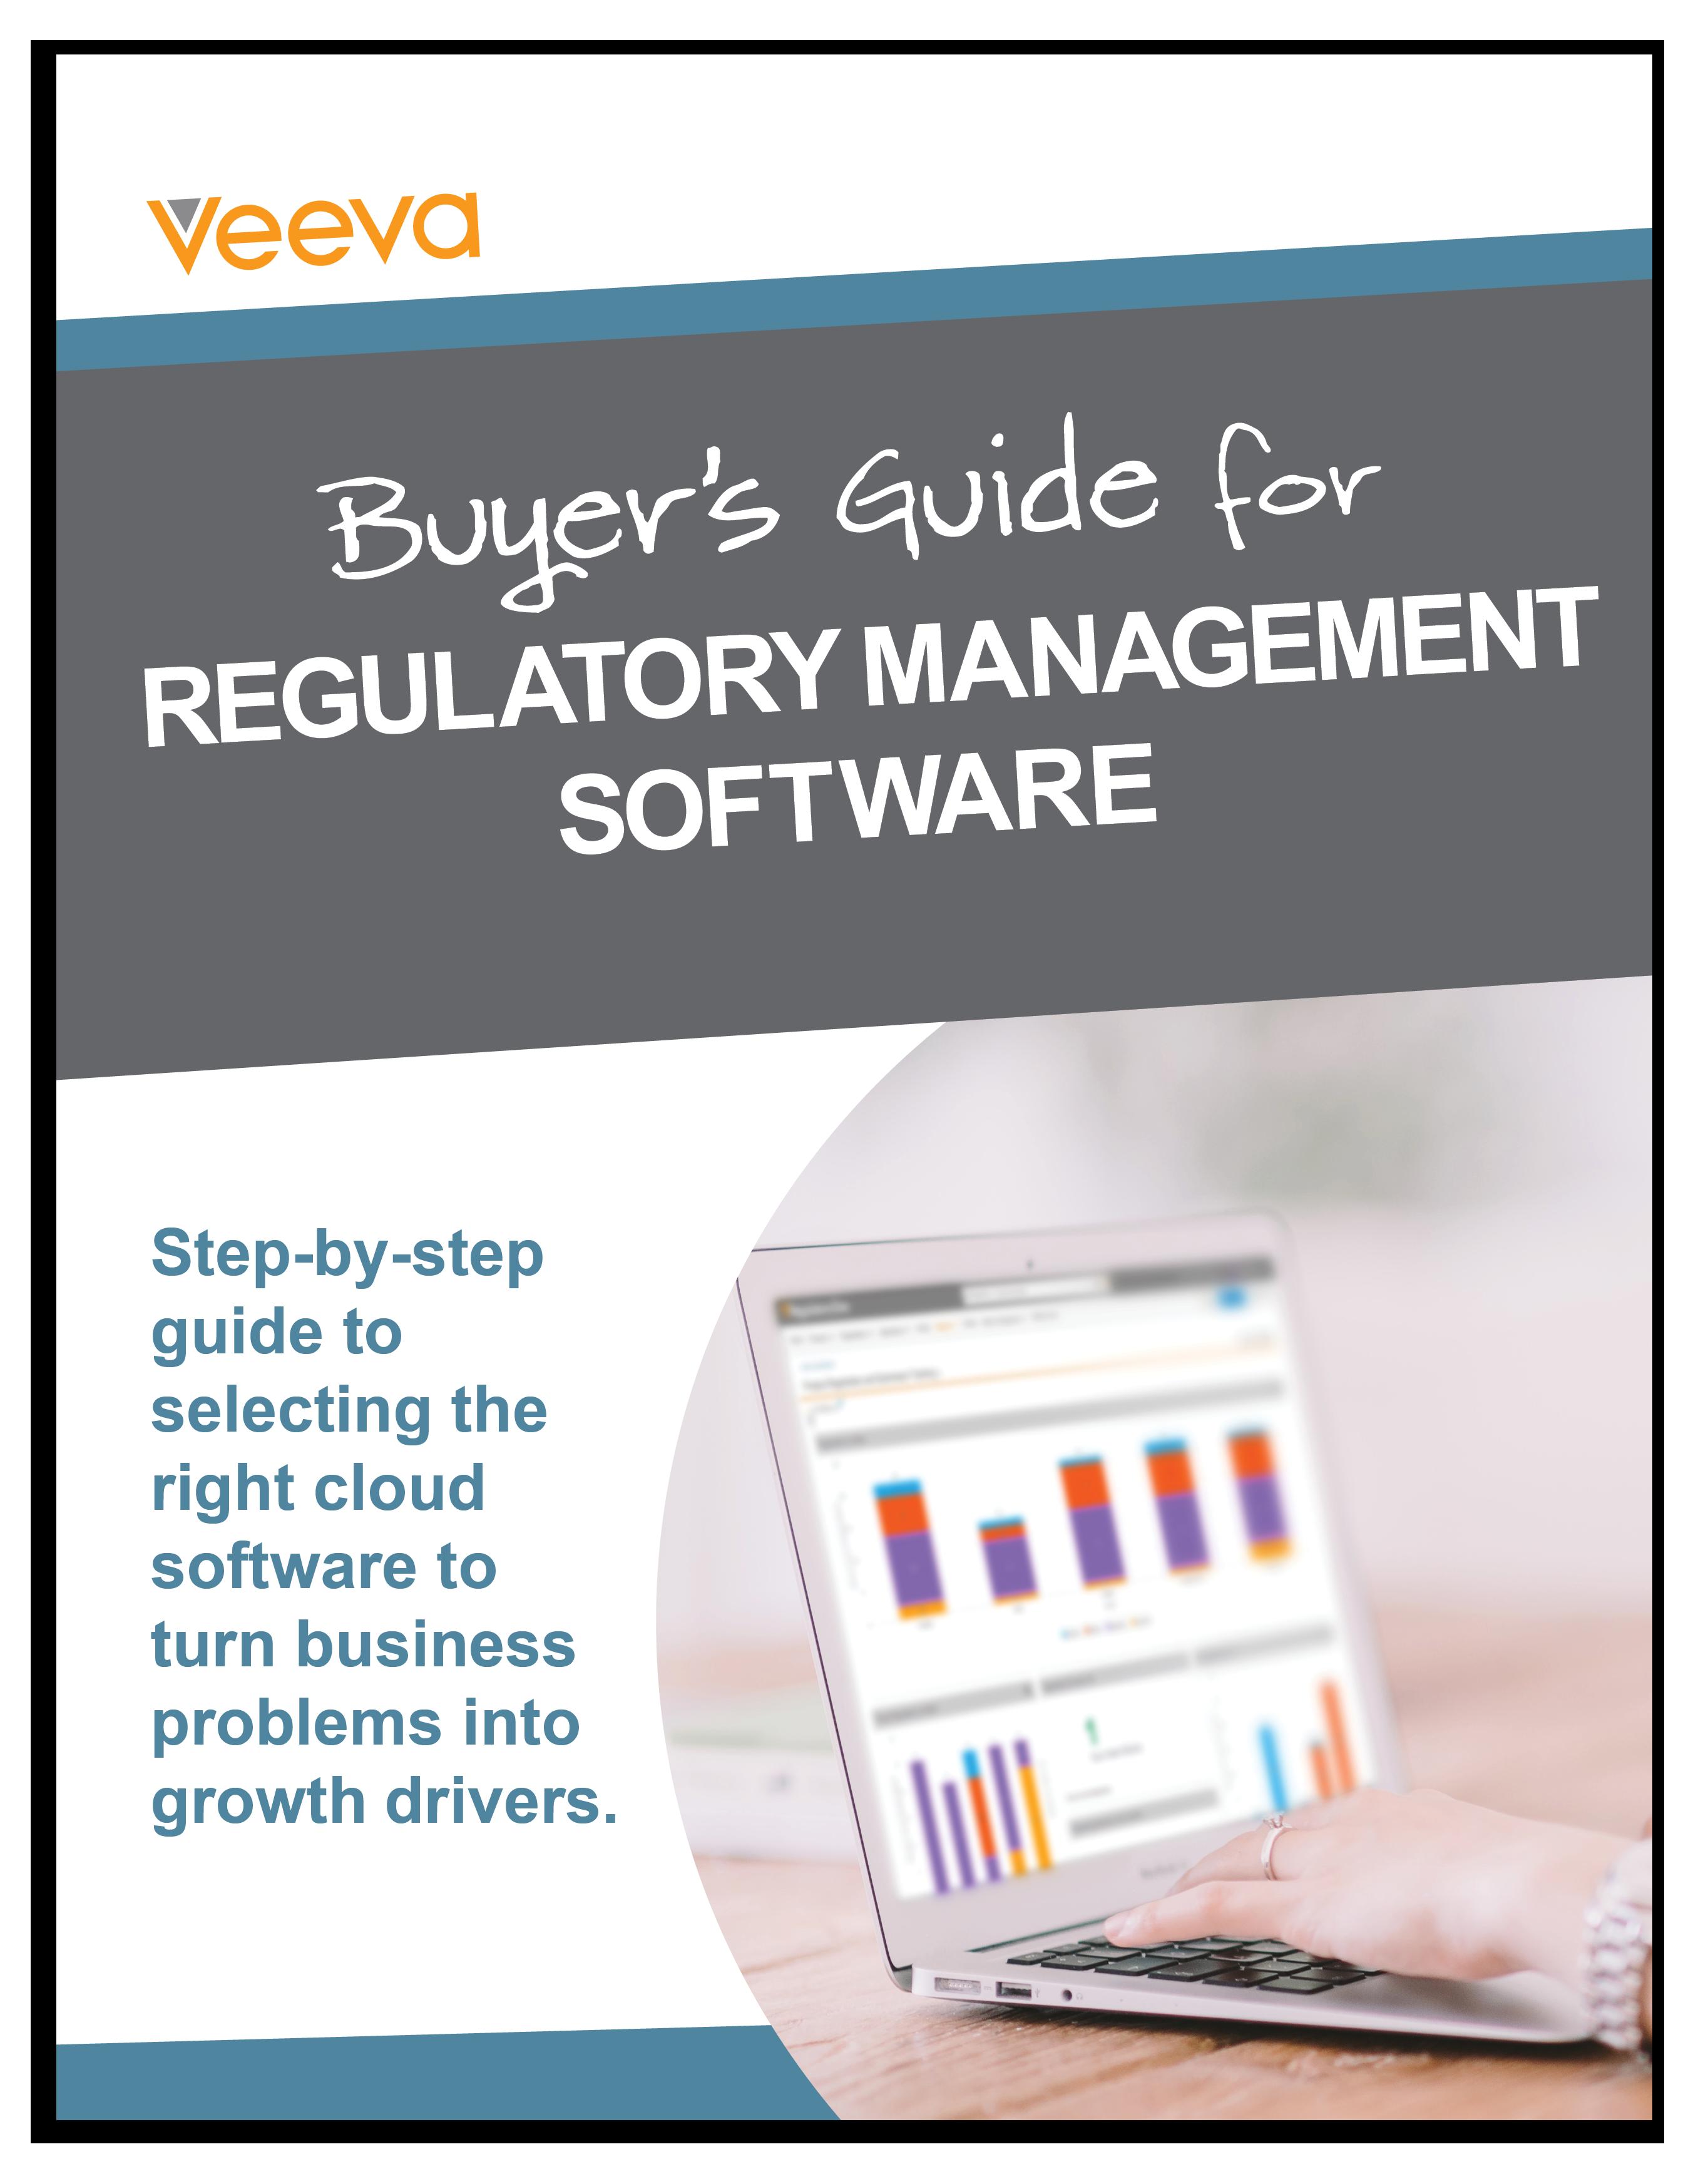 Buyer's Guide for Cloud Regulatory Management Software eBook